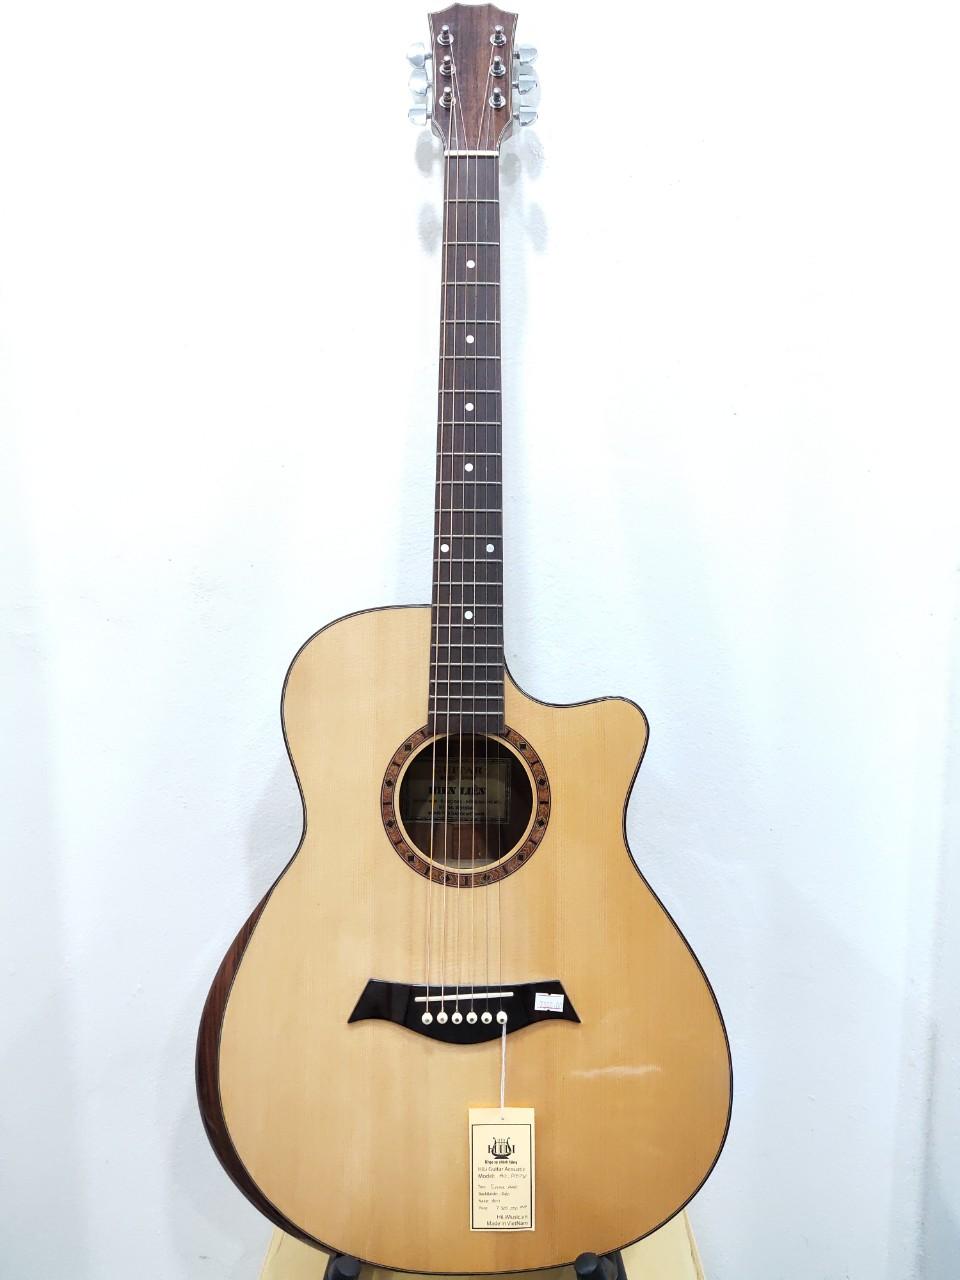 Đàn Guitar Acoustic AG-26DV made in VietNam